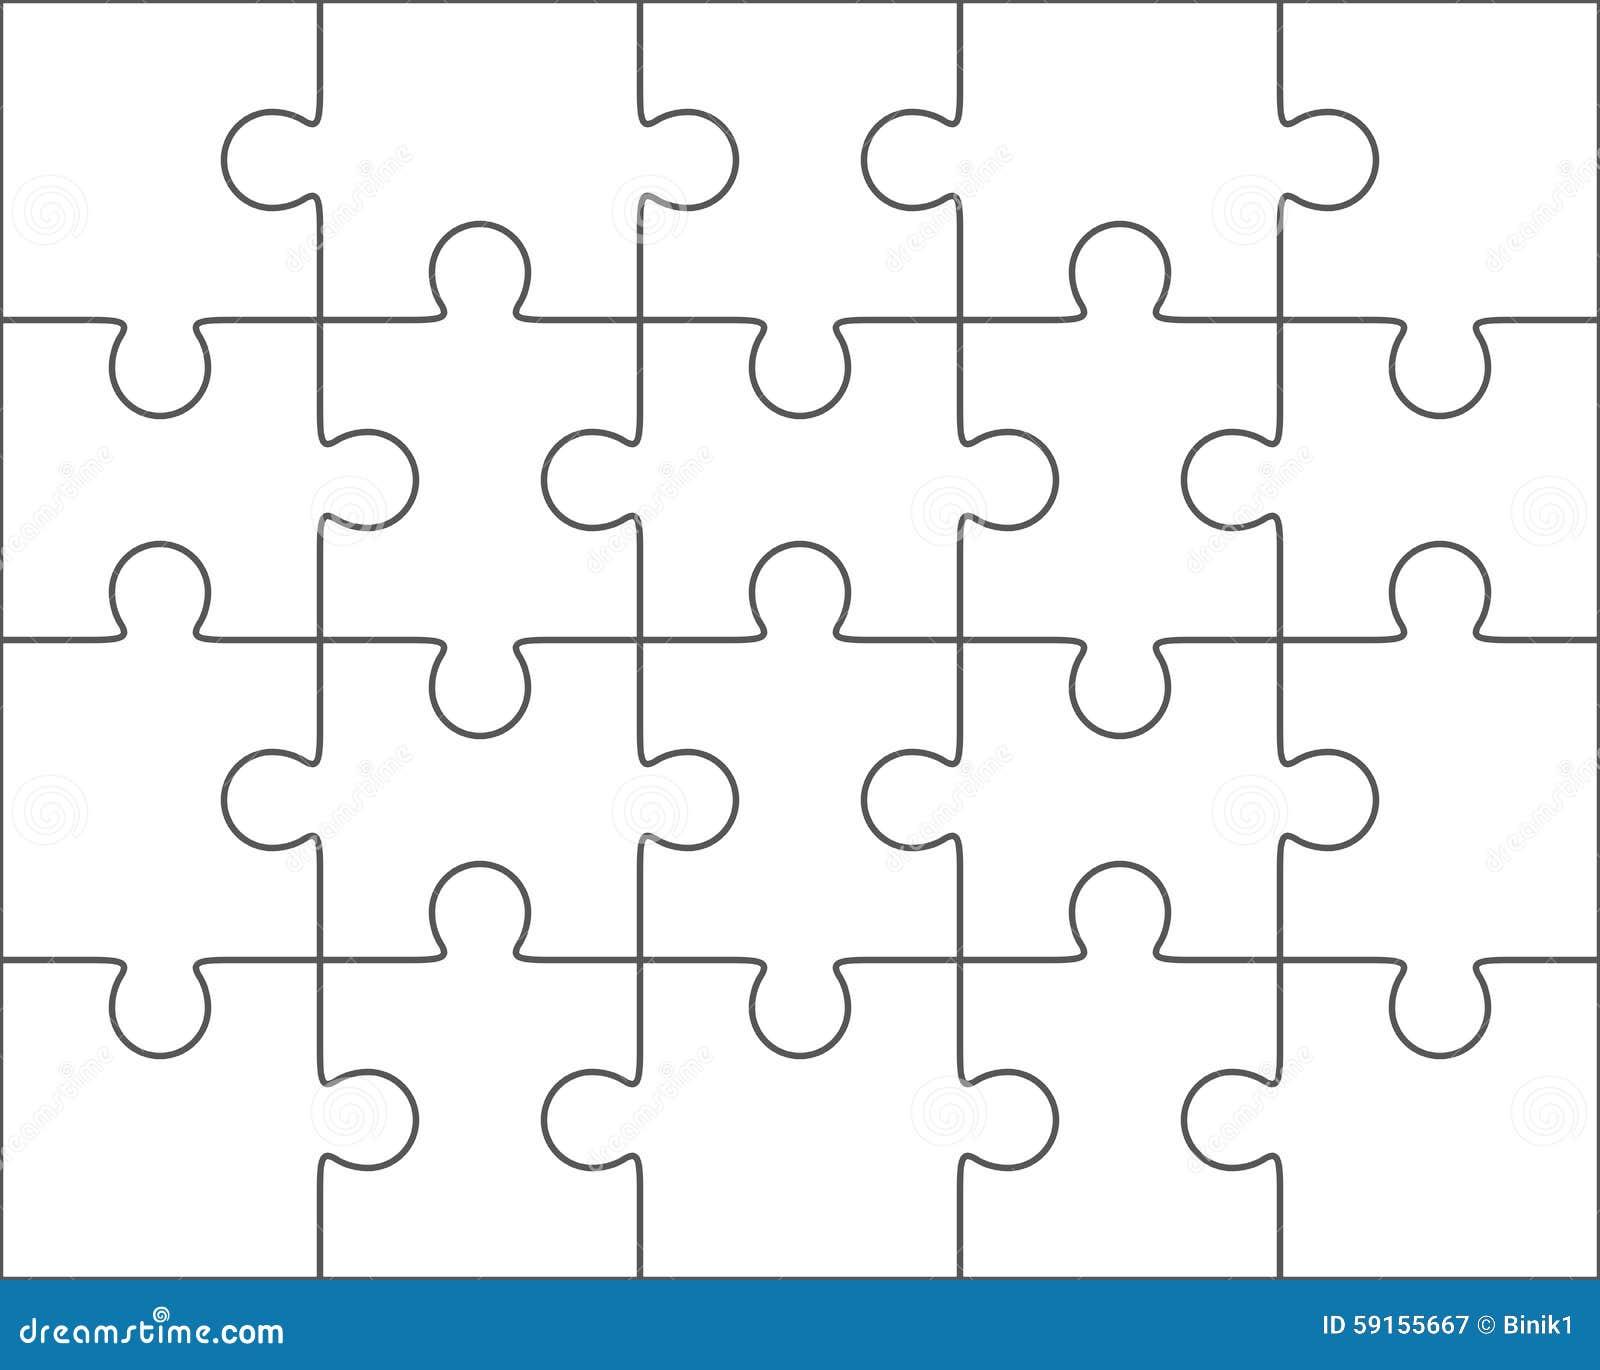 Jigsaw Puzzle Blank Template 4x5, Twenty Pieces Stock Illustration ...